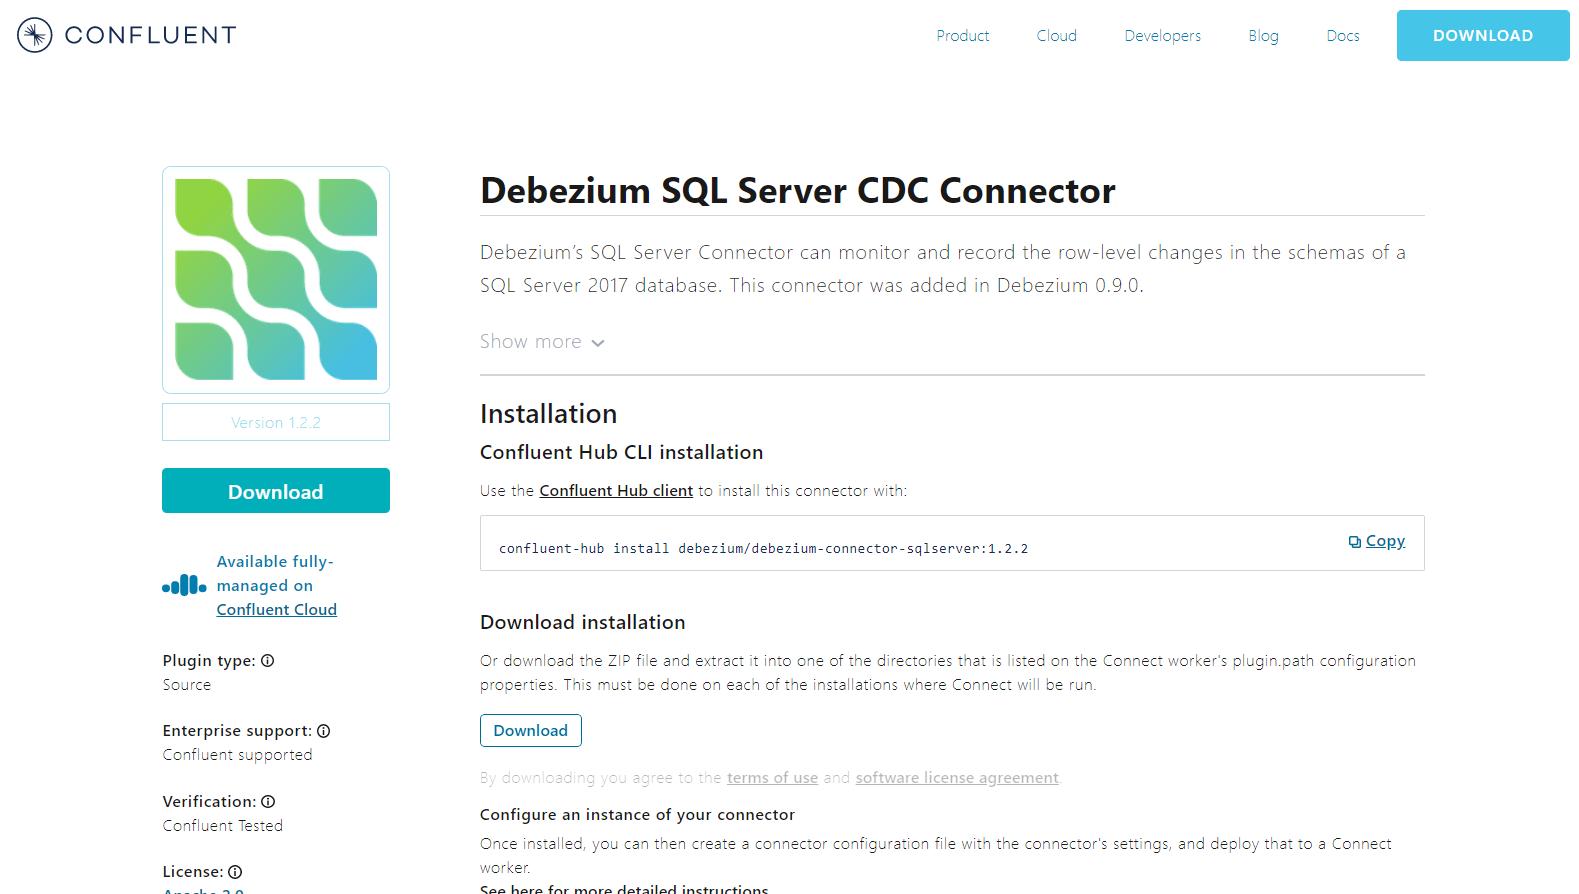 Installing the Debezium SQL Server Connector.